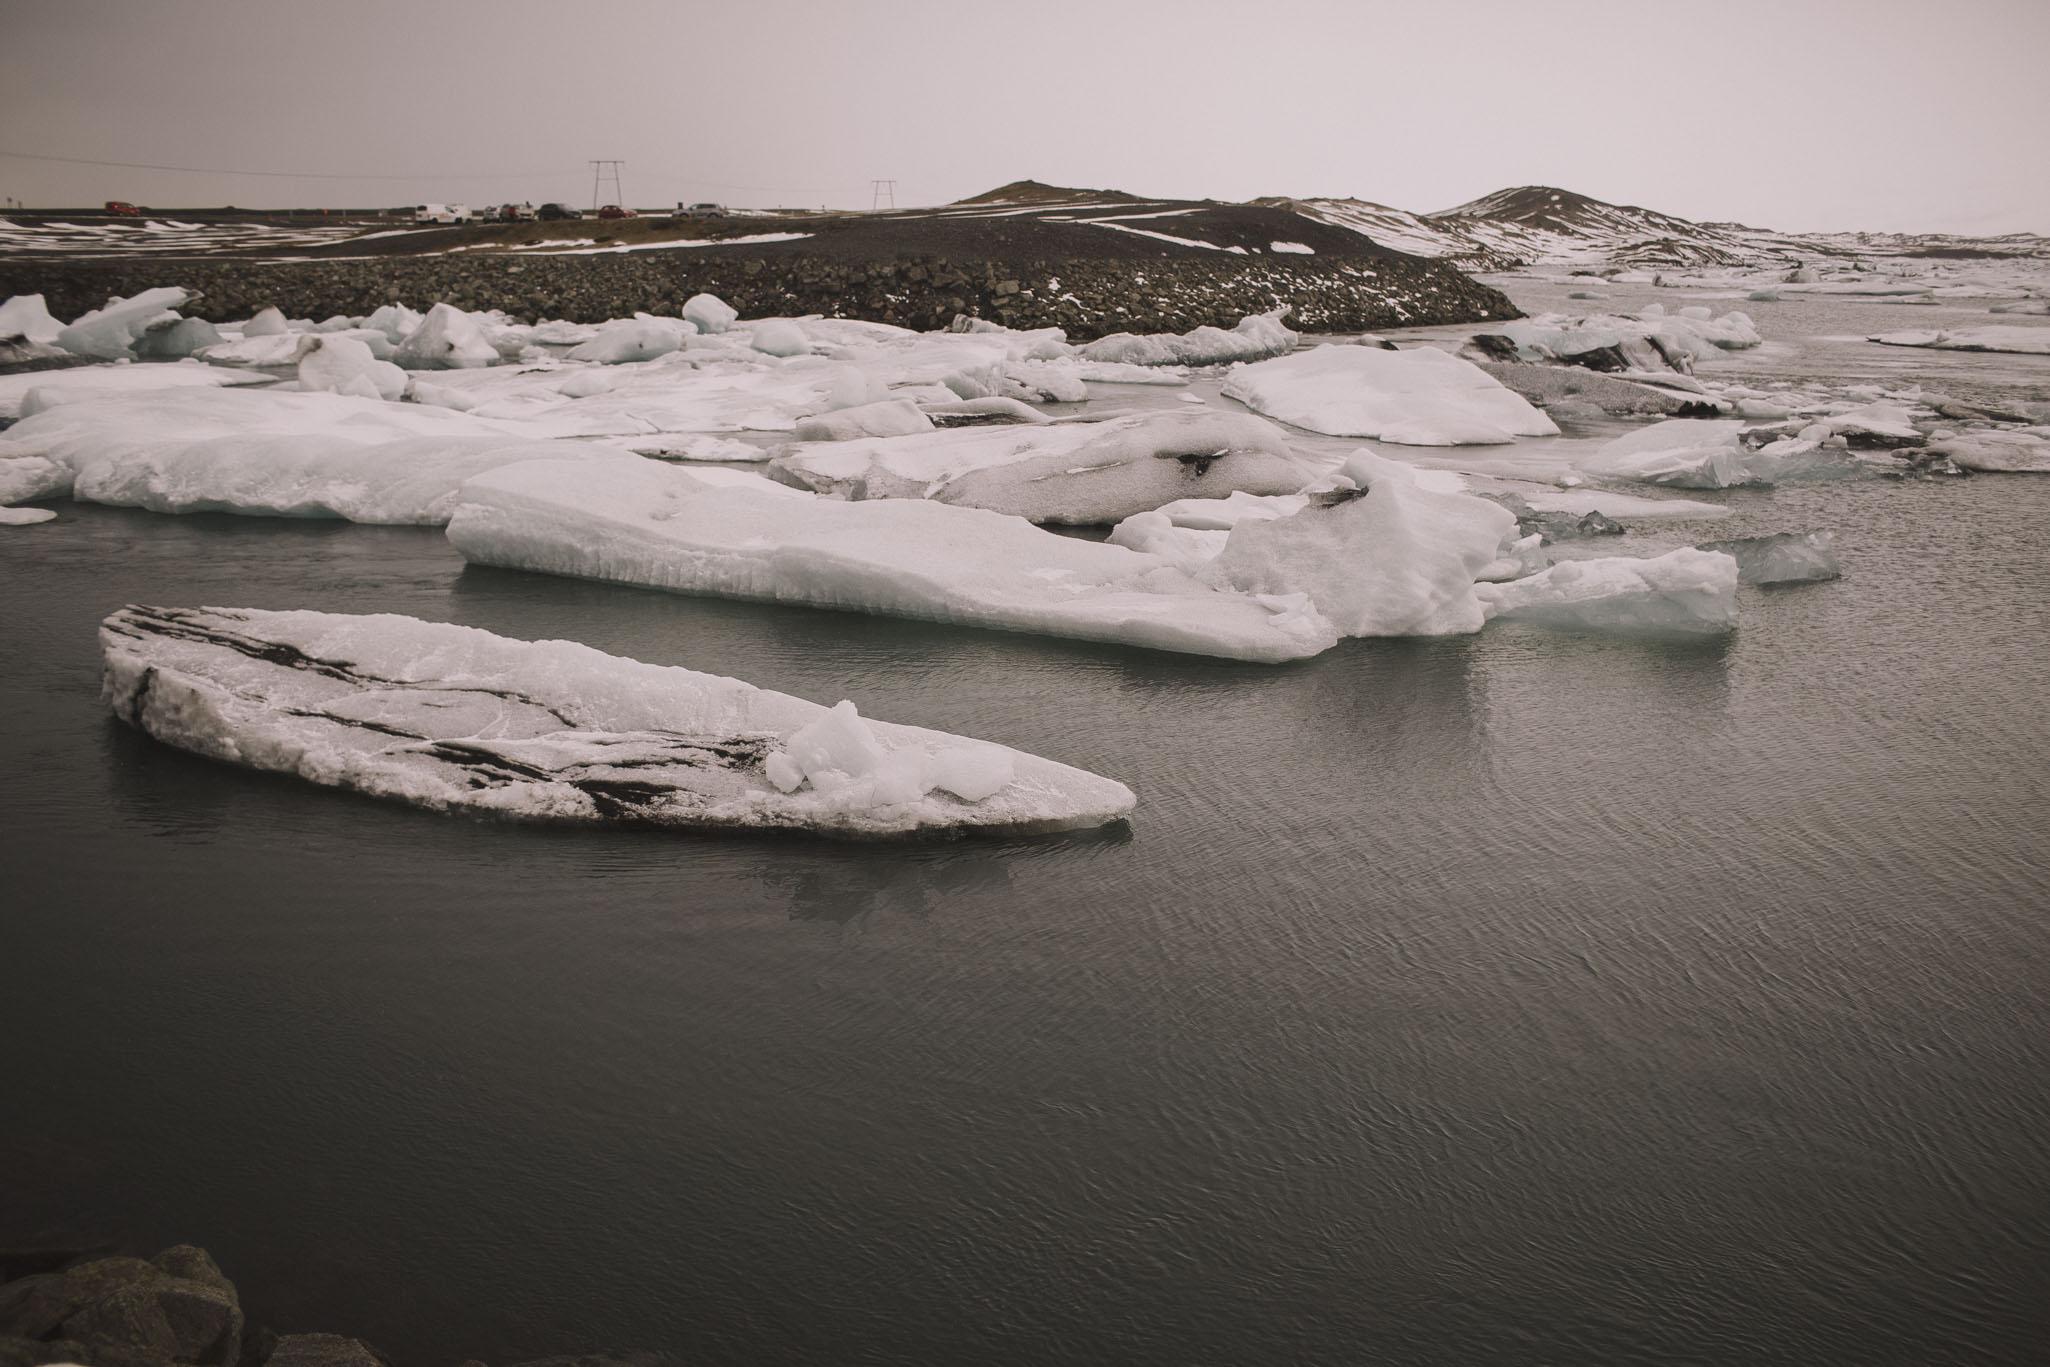 Road-trip-Islande-Iceland-Voyage-Travel-Portrait-Jérémy-Boyer-Jokulsarlon-Ice-Beach-plage-glace-3.jpg